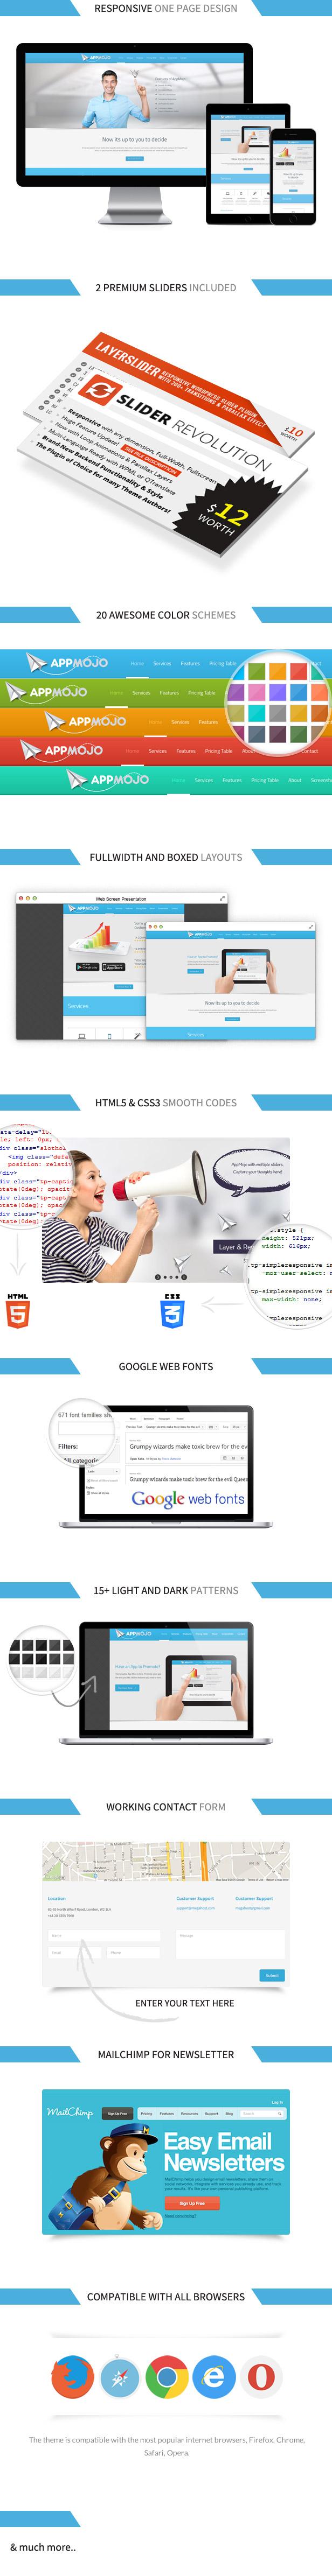 App Mojo - Single Page Software Promotion HTML - 4